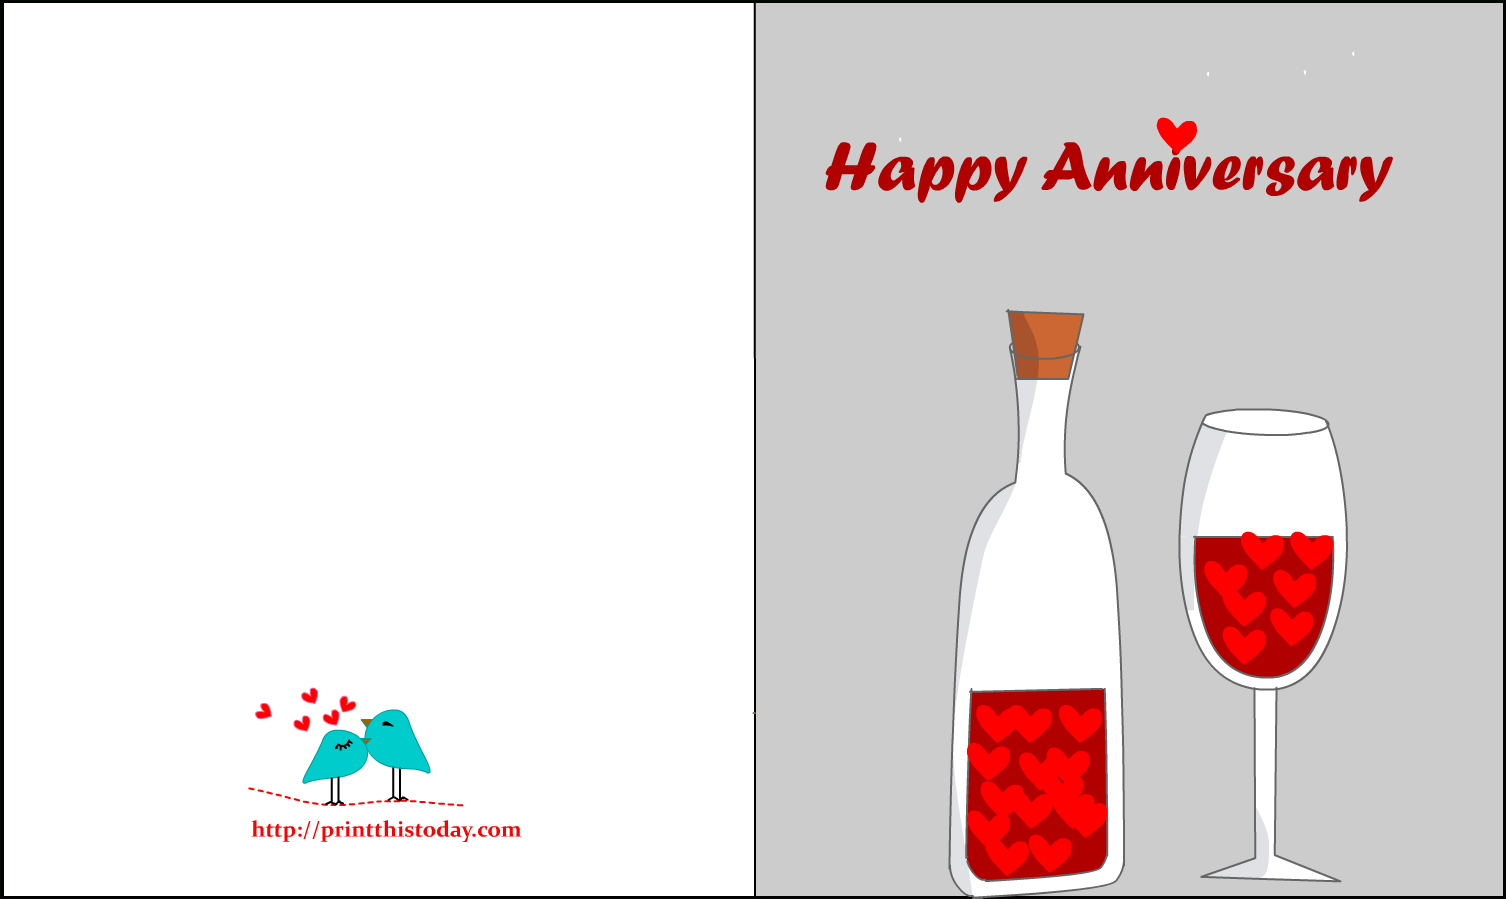 Hd Free Printable Anniversary Cards - Wedding Anniversary Card Print - Free Printable Anniversary Cards